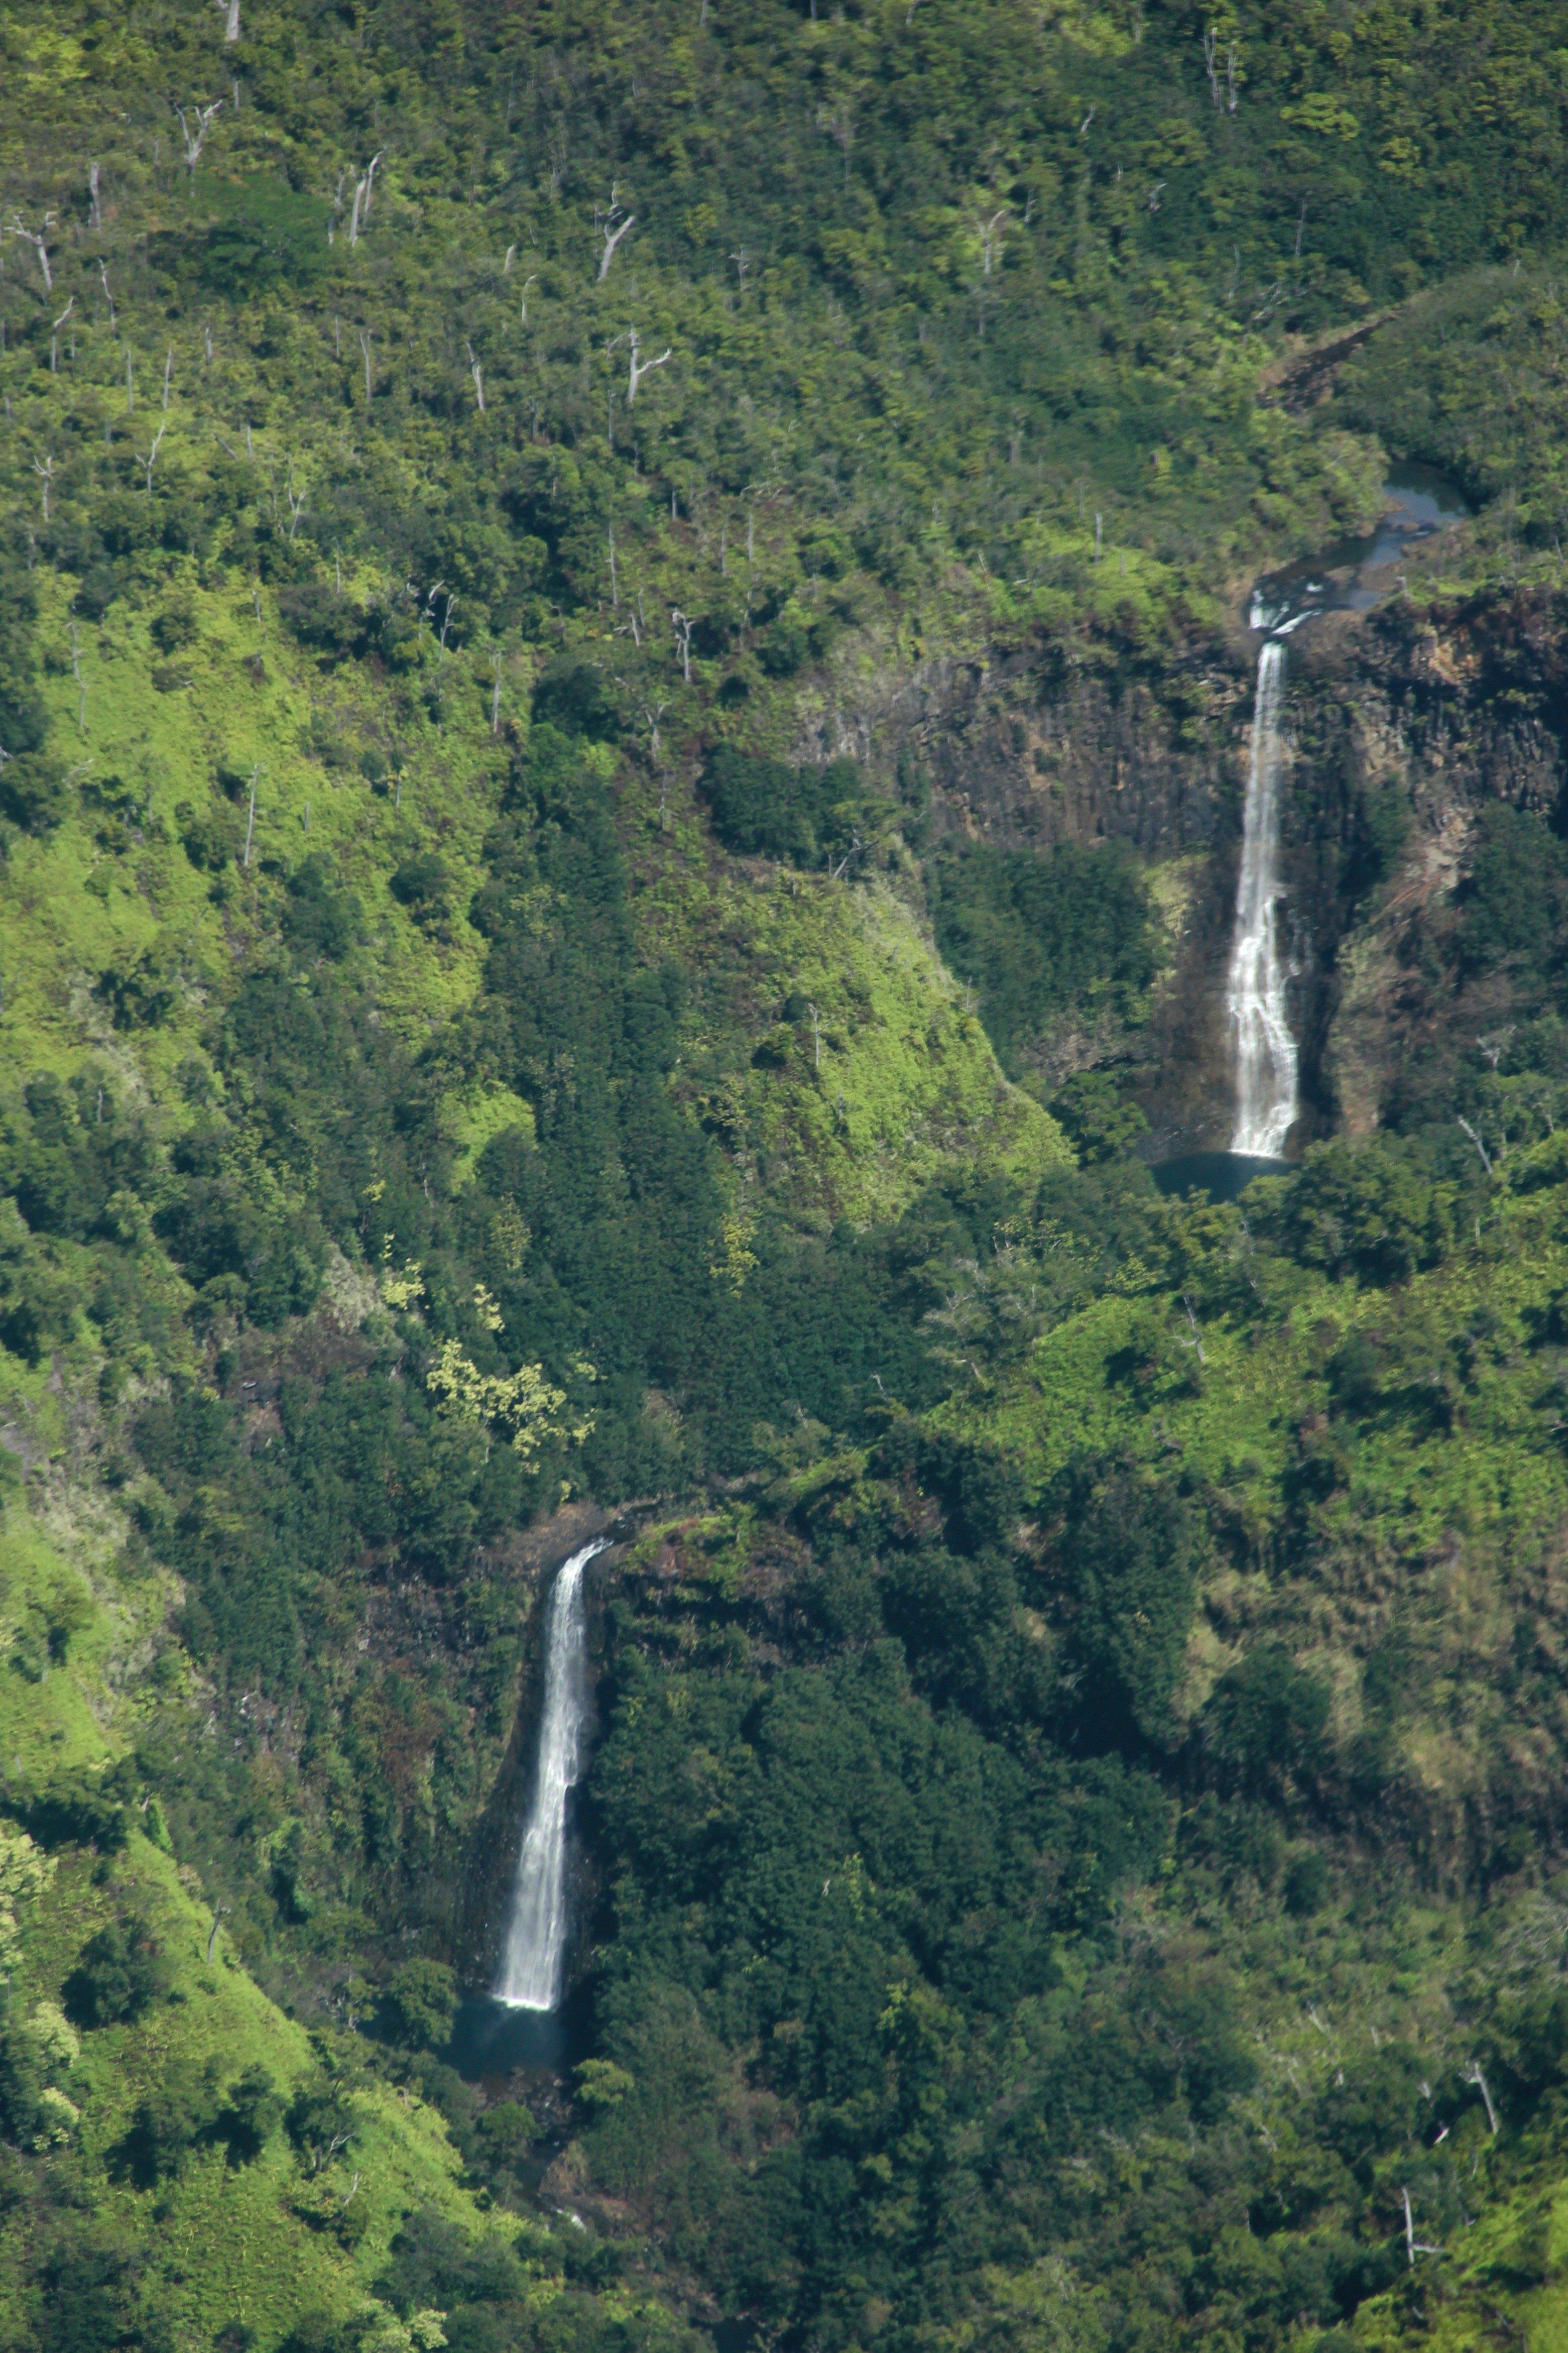 Manawaihapuna Falls, Kauai